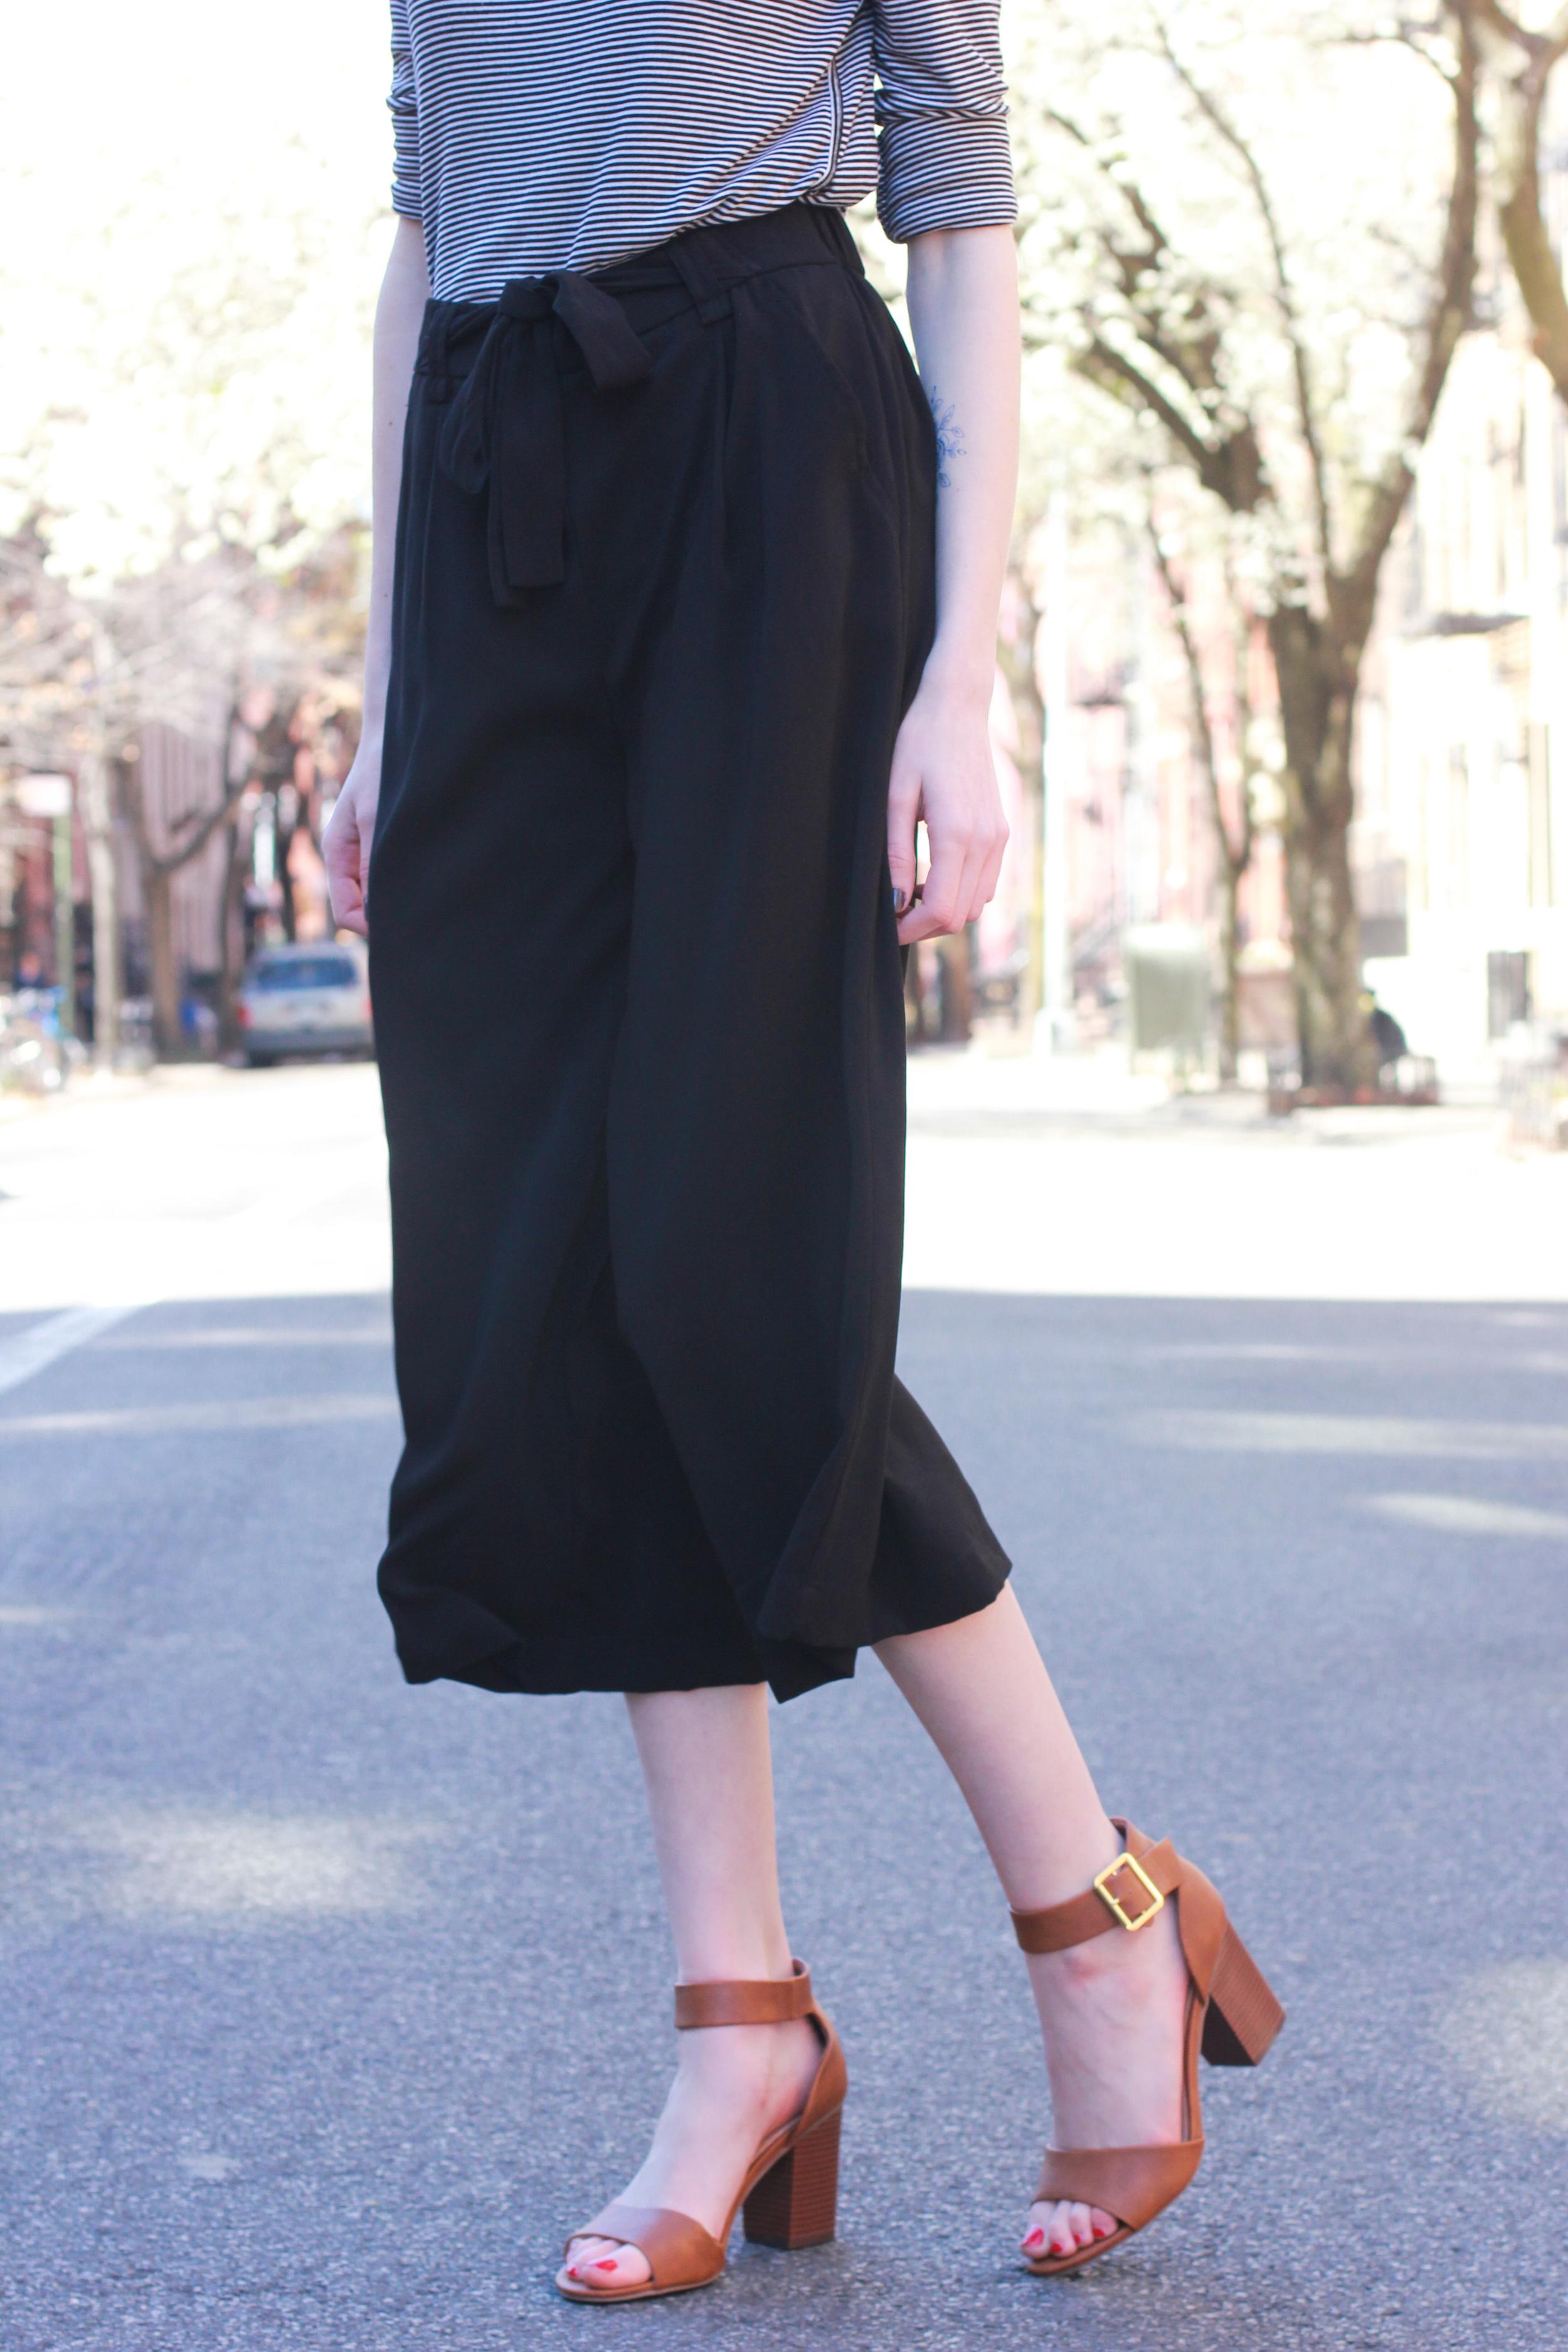 LOFT striped longsleeve top, Zara black high waisted culottes, Target brown black heel sandals, J.Crew tortoiseshell statement necklace, DVF micro milo crossbody bag